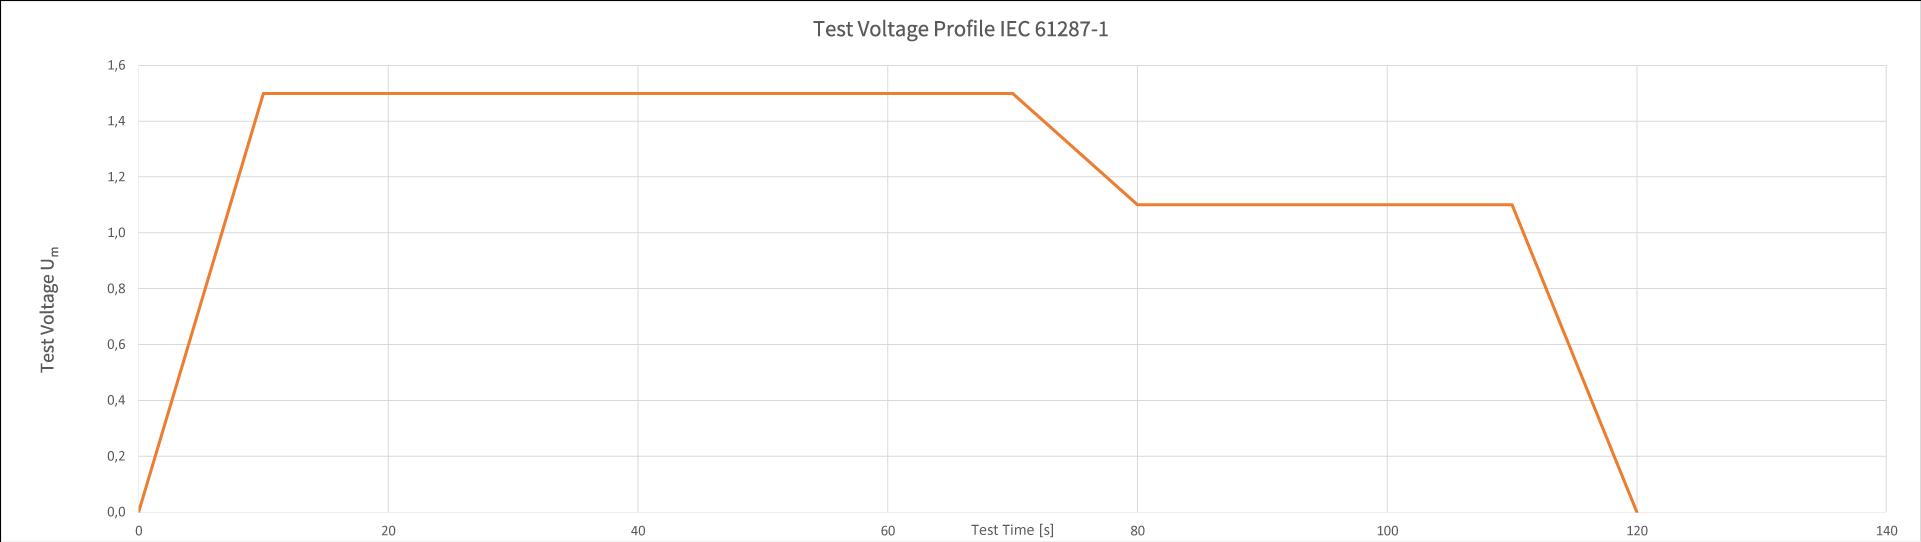 Test-Profile-Voltage-ICE61287-1